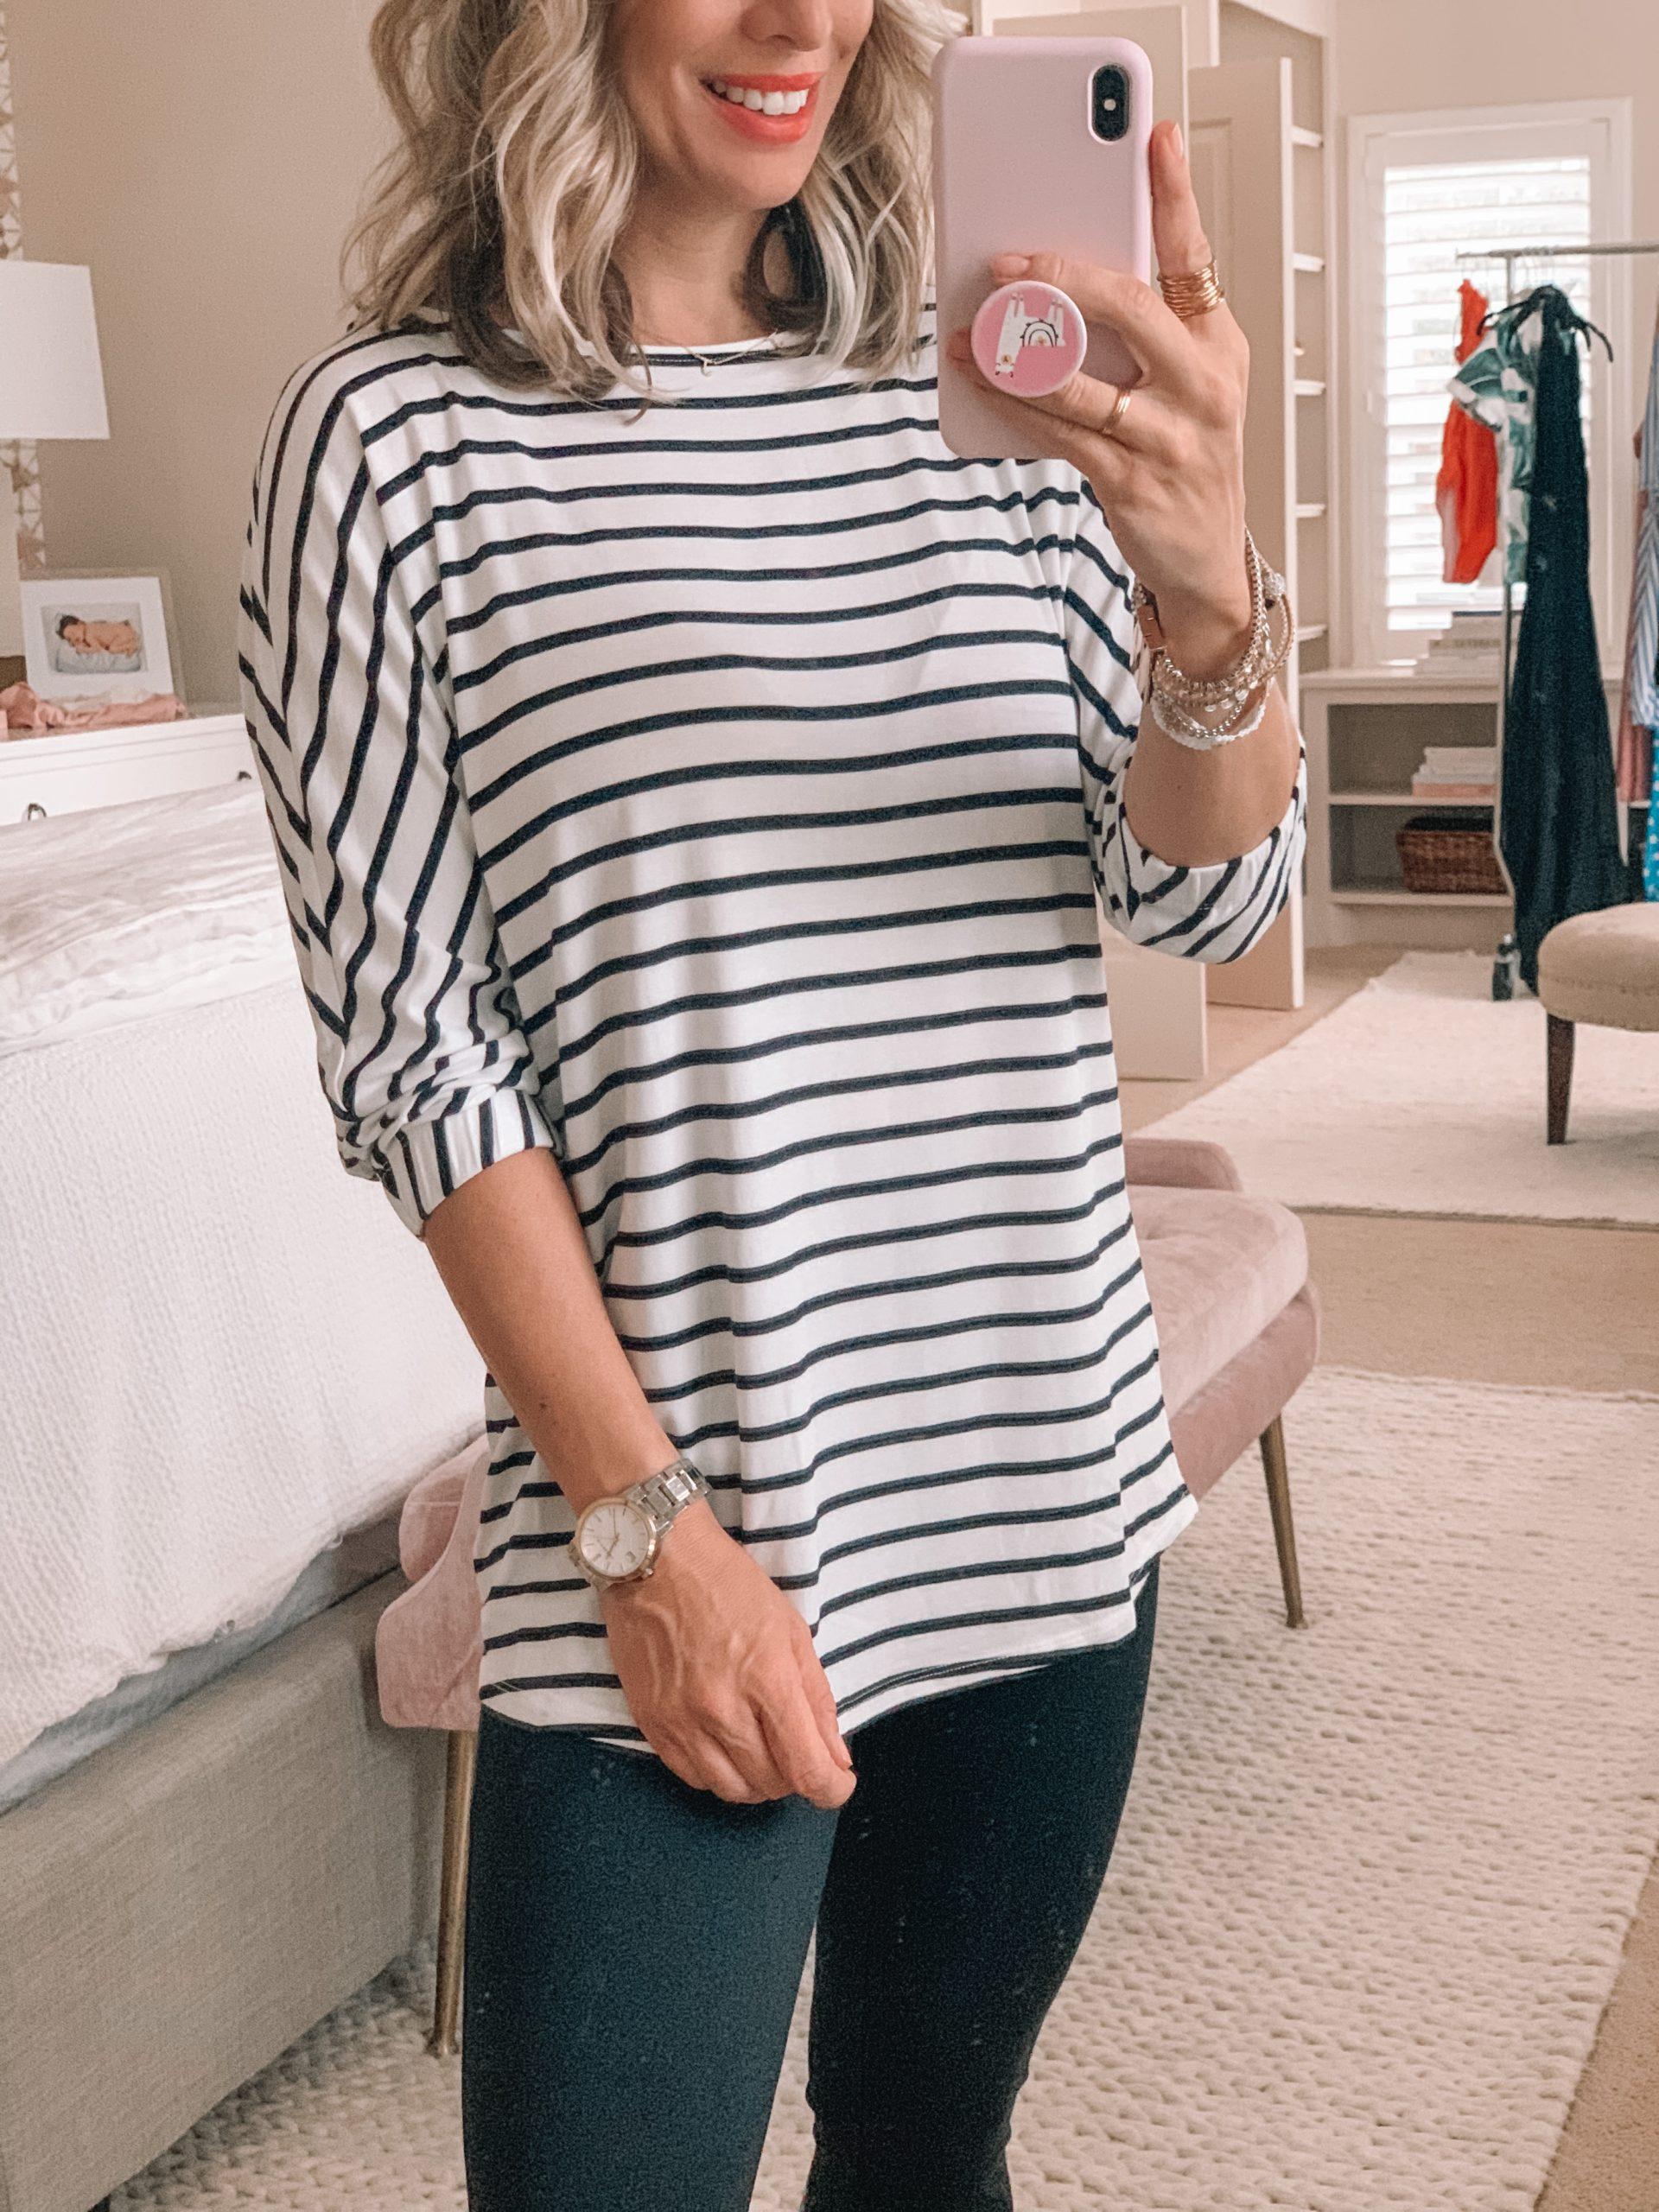 Amazon Fashion - Striped Jersey Bunch Sleeve Top, Ponte Leggings